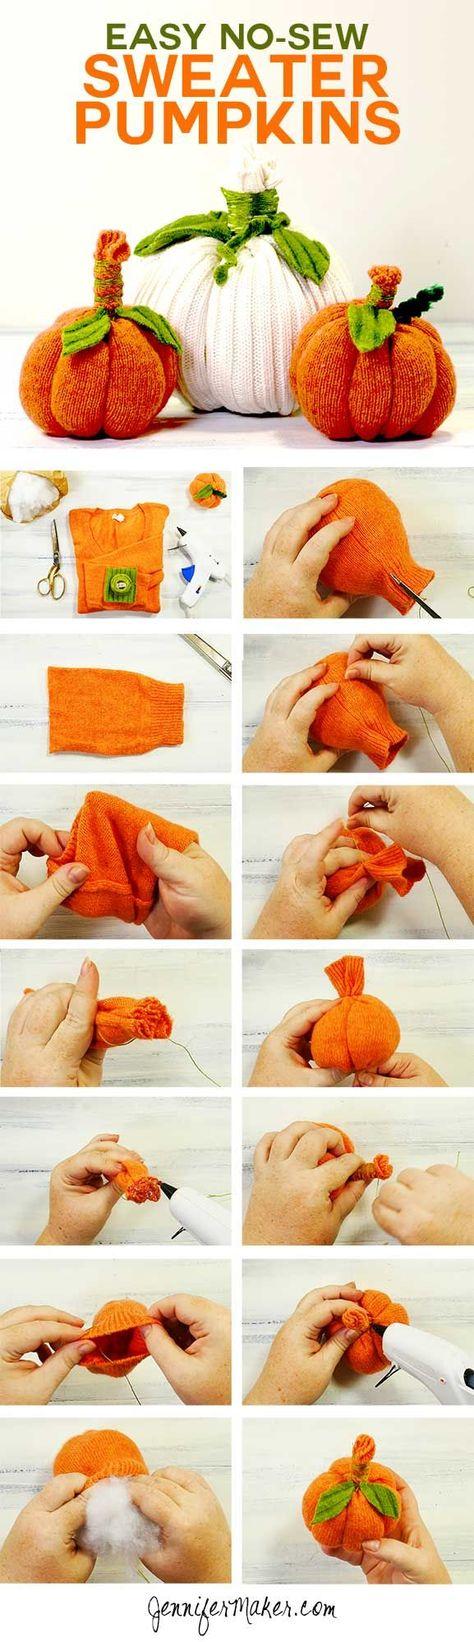 Sweater Pumpkins Tutorial - Easy No-Sew Project for Fall - Jennifer Maker